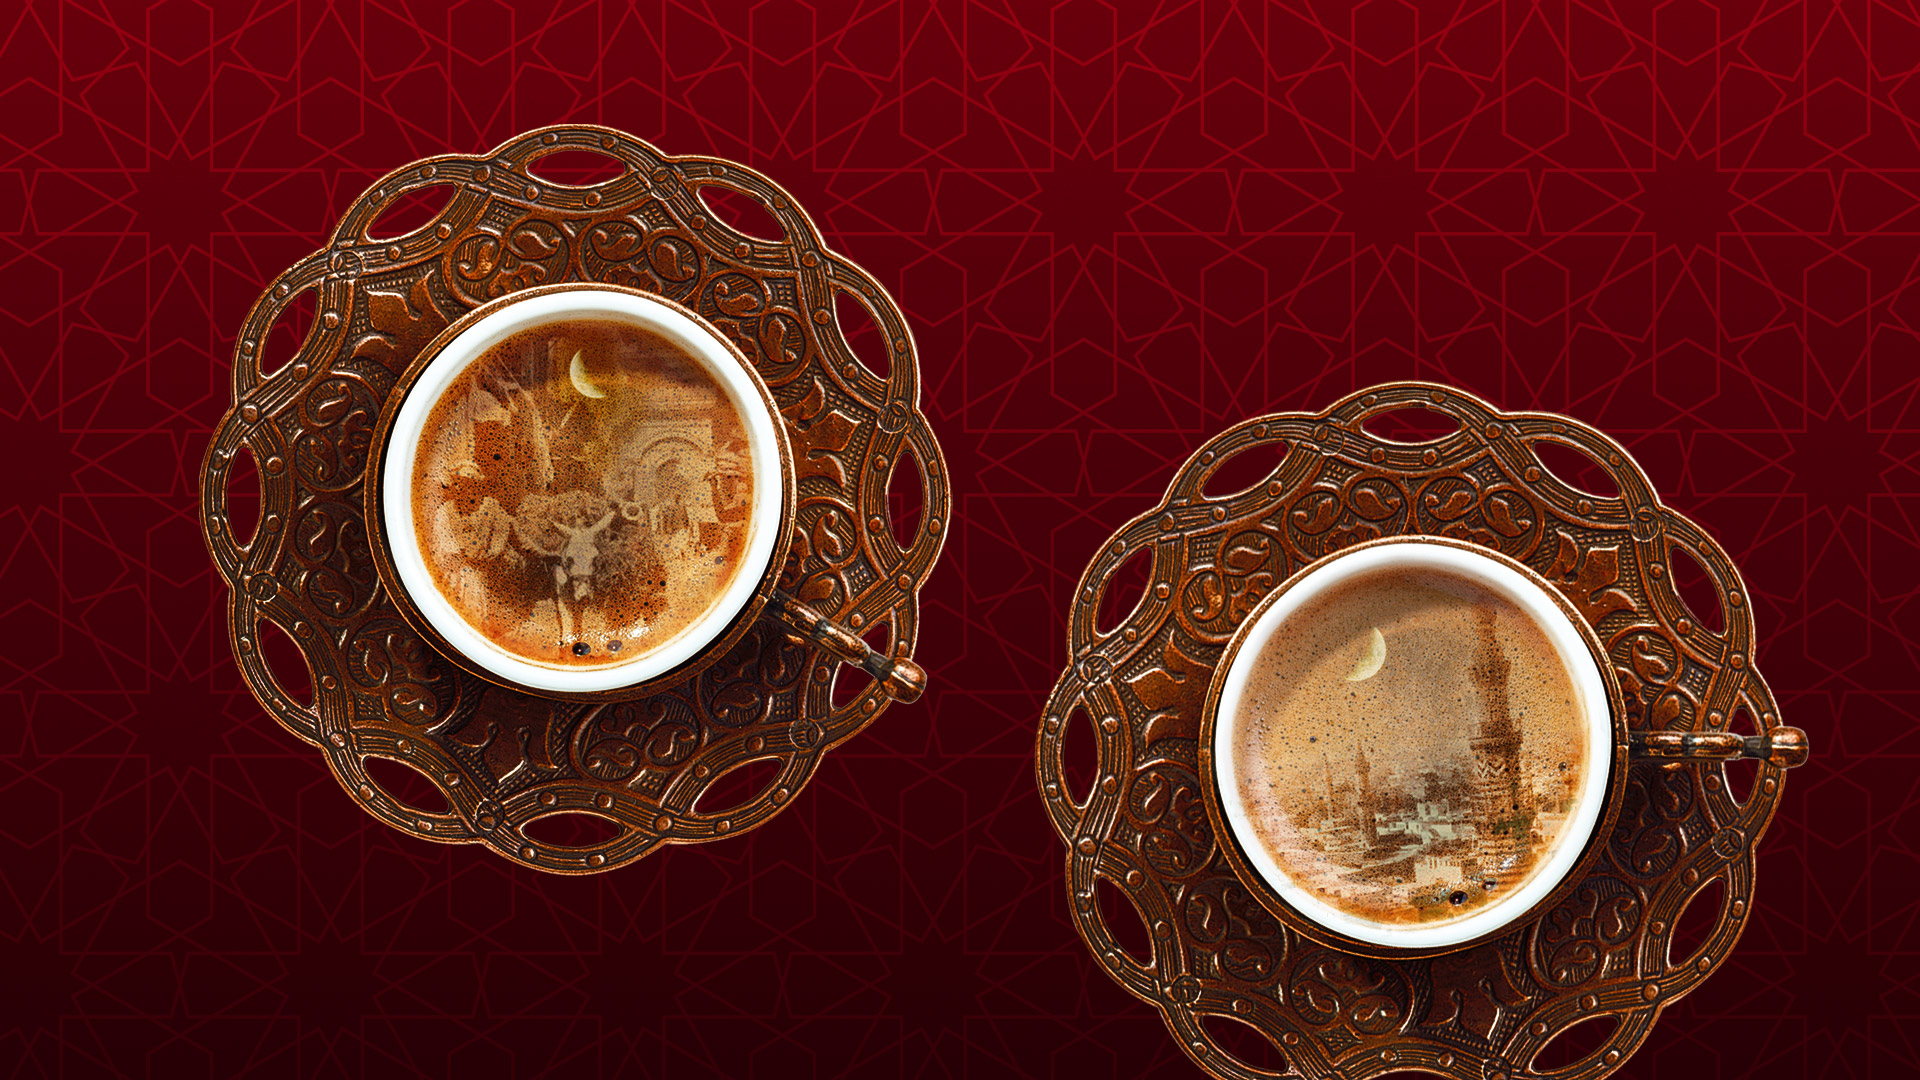 Al Qahwa – Maryem Tollar, Ernie Tollar, Demetri Petsalakis, Naghmeh Farahmand